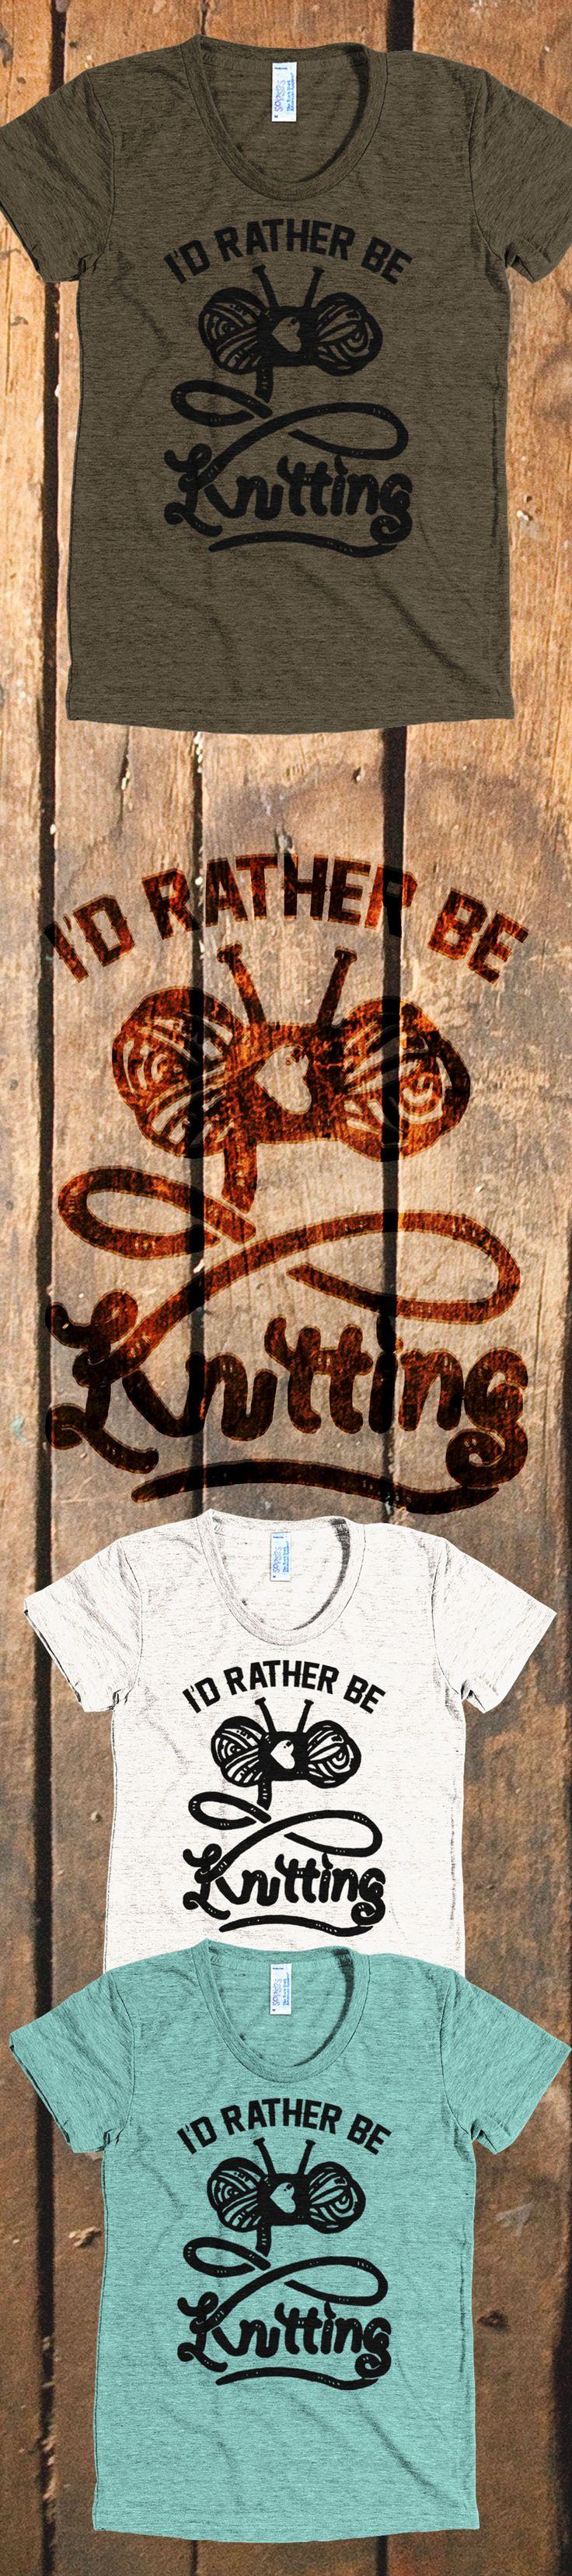 620 best Knitting Patterns & Stitches images on Pinterest | Knitting ...